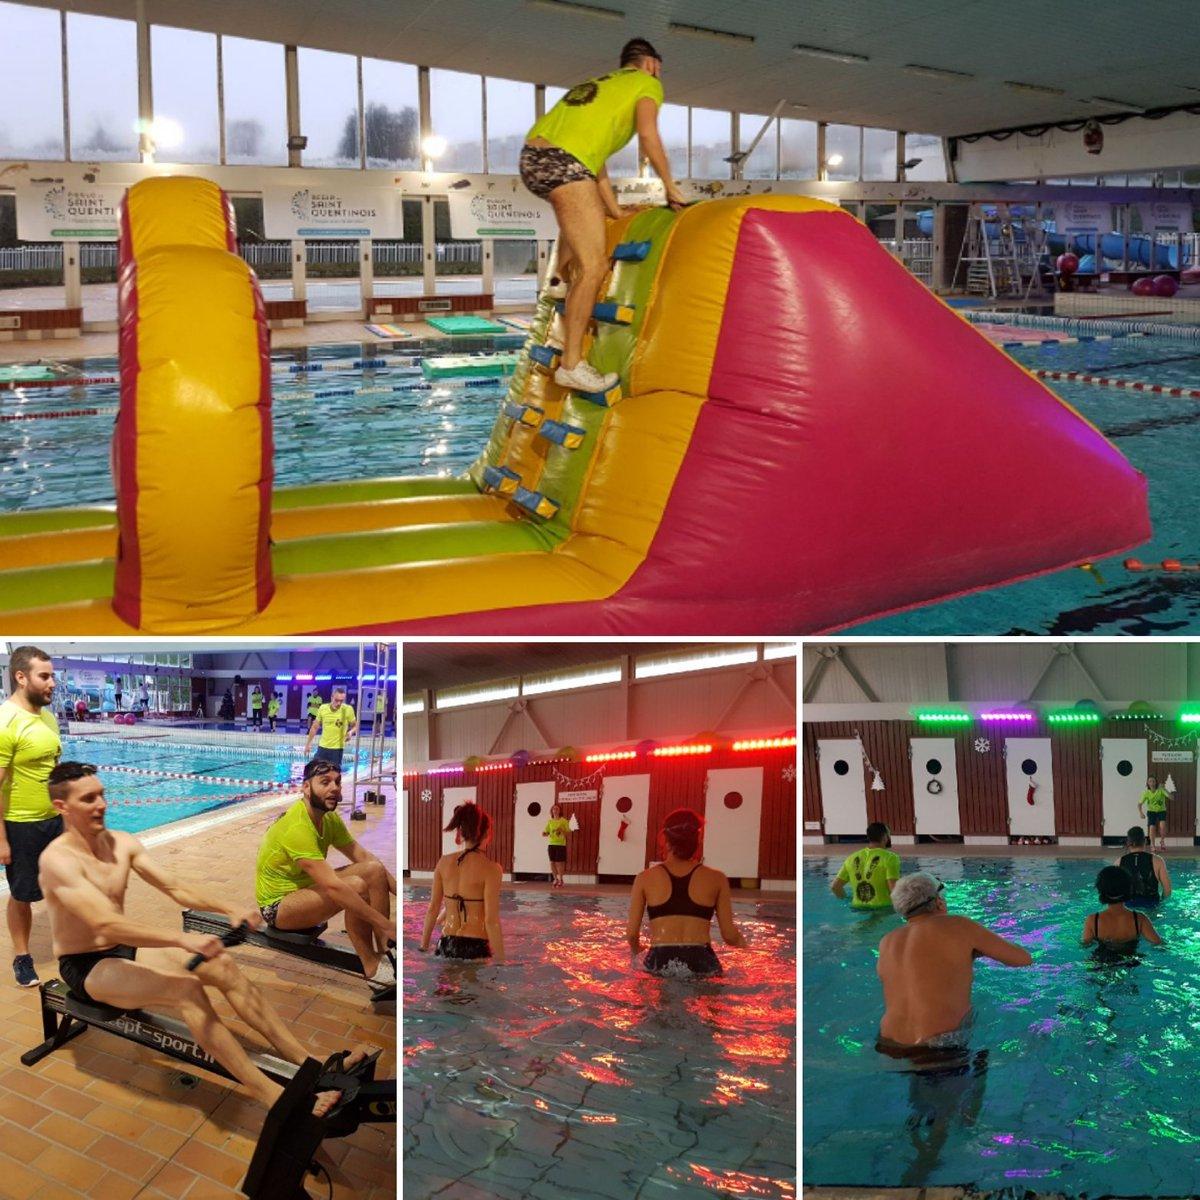 Aqua Cross Fit à la piscine Jean Bouin 💪🏻🔥💦#aquacrossfit #piscine #sport #Grandbouin #AggloSaintQuentinois https://t.co/BYKeuV4Xo0